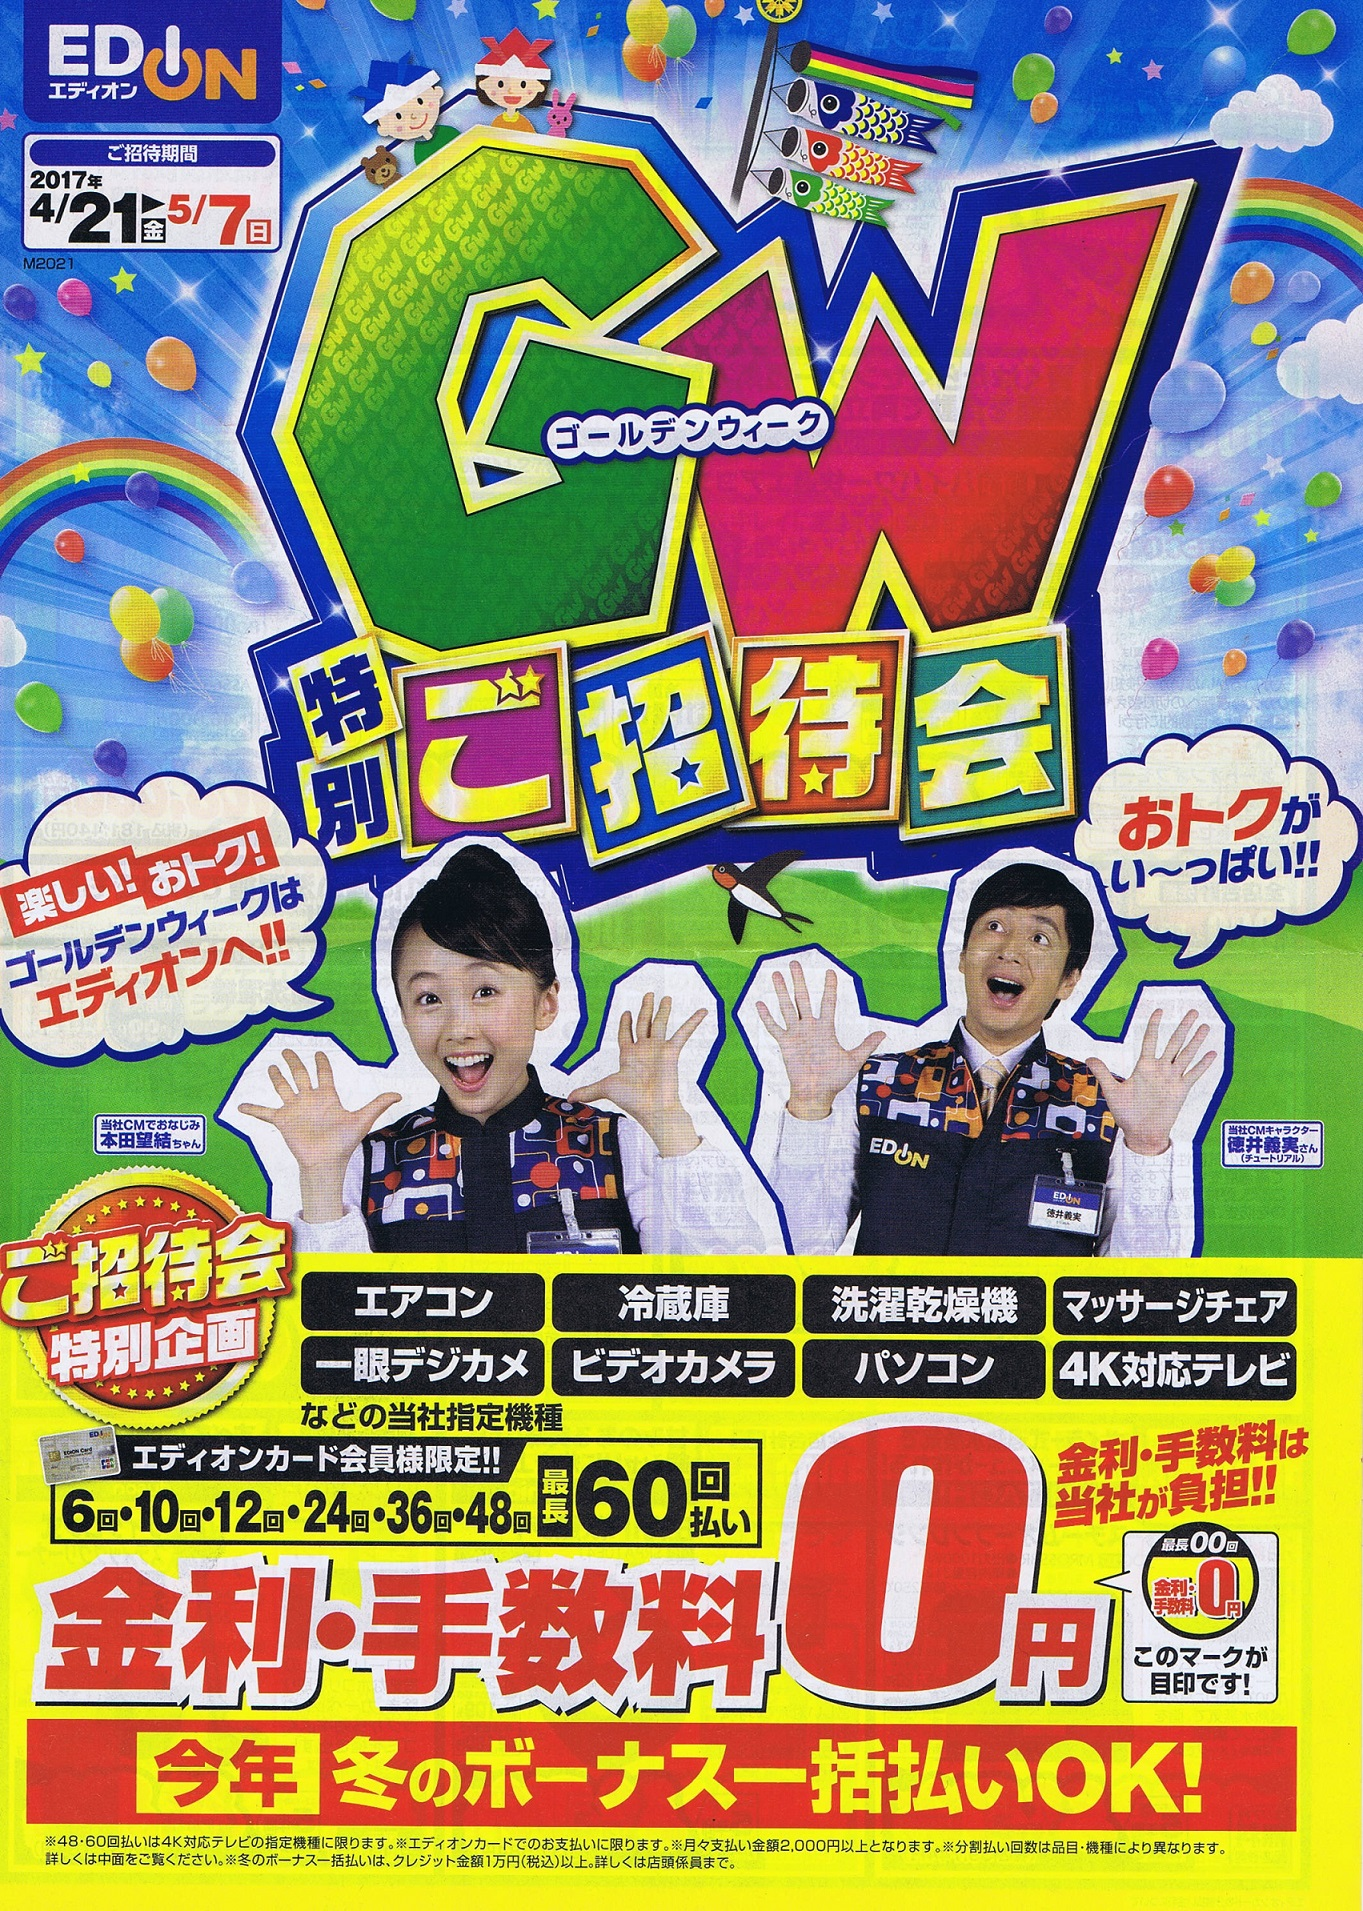 2017年GW特別ご招待会